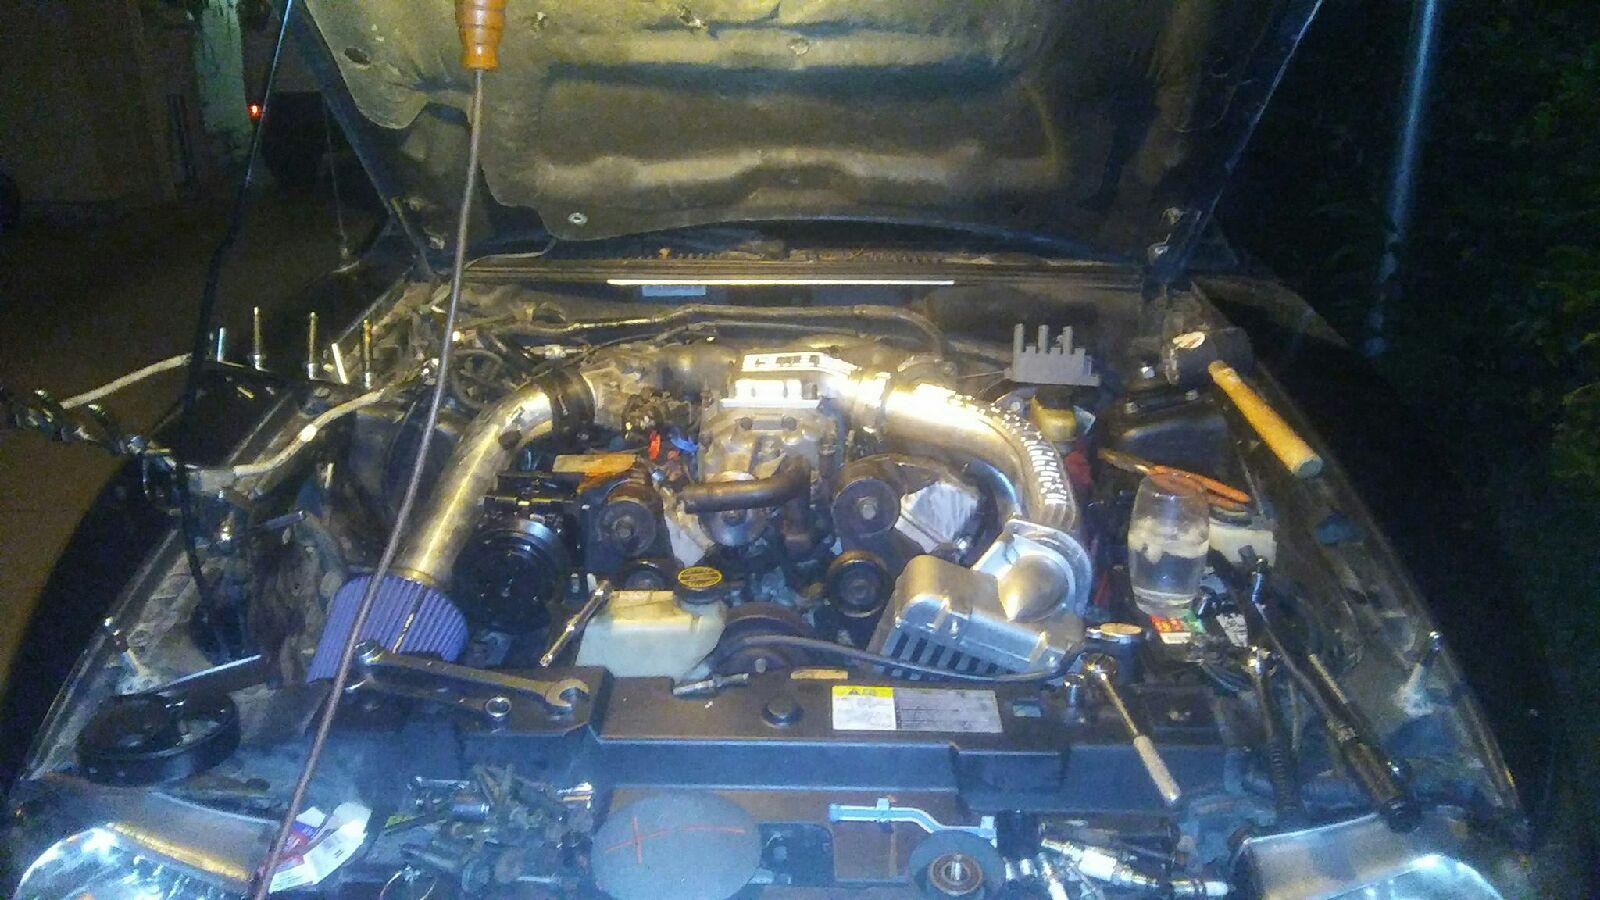 Building a 3 8 L Essex V6 That Makes 557 WHP – Engine Swap Depot